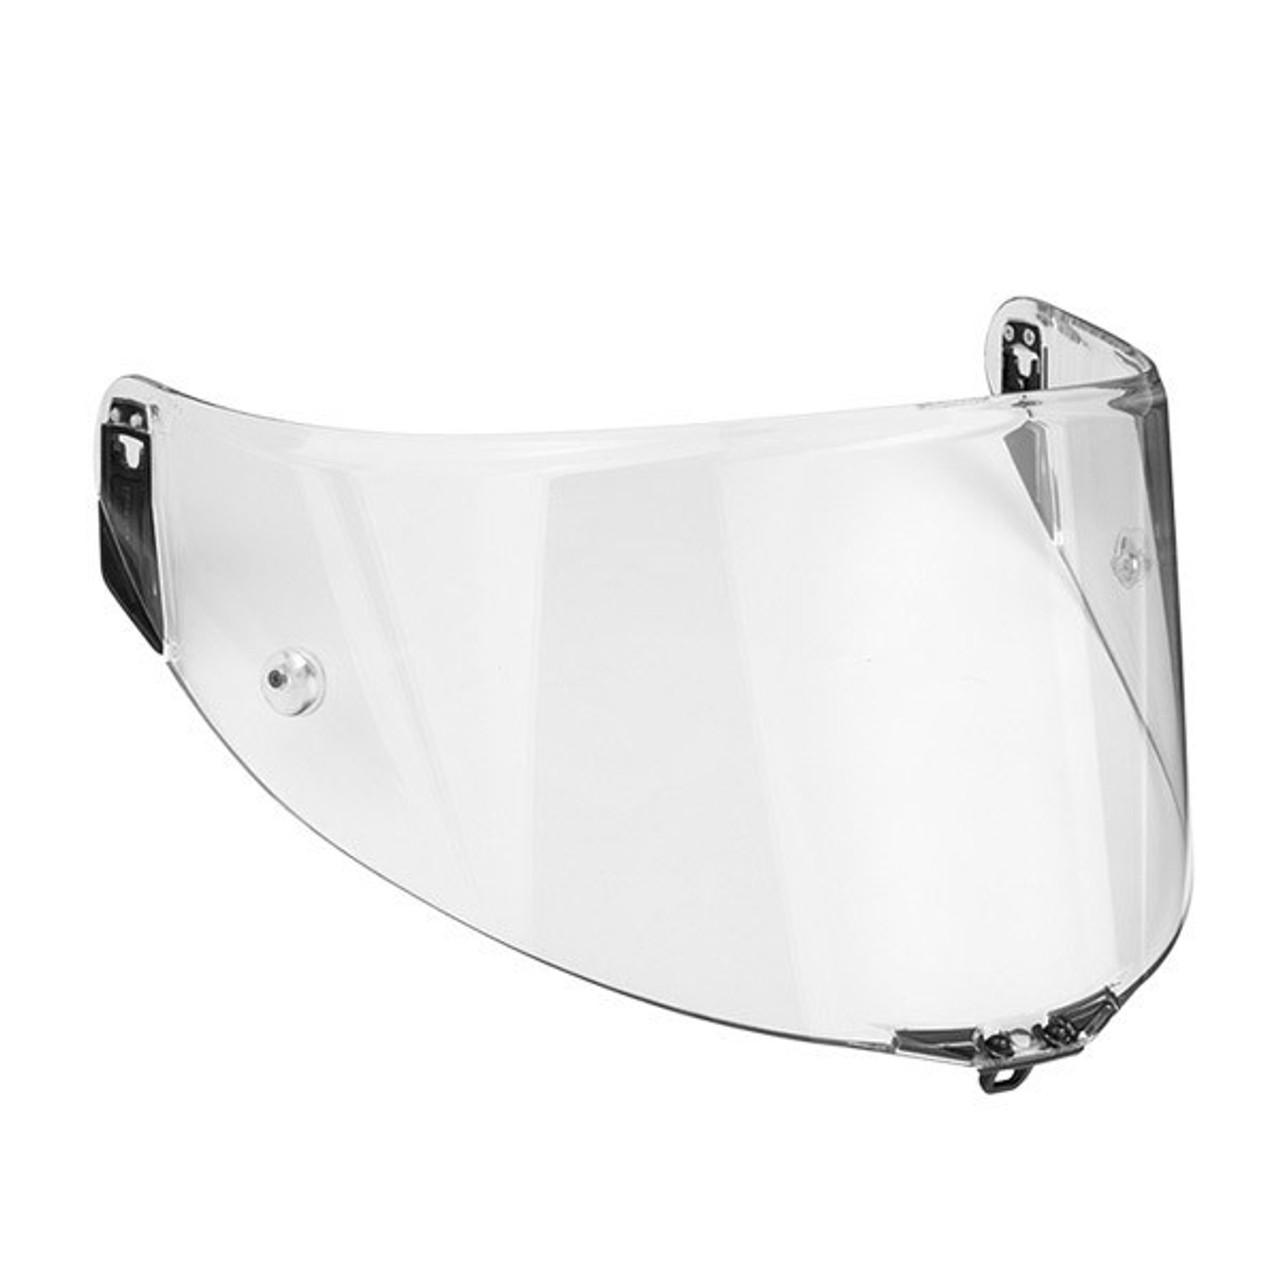 Agv Pista Gp Helmet Face Shield Sportbike Track Gear